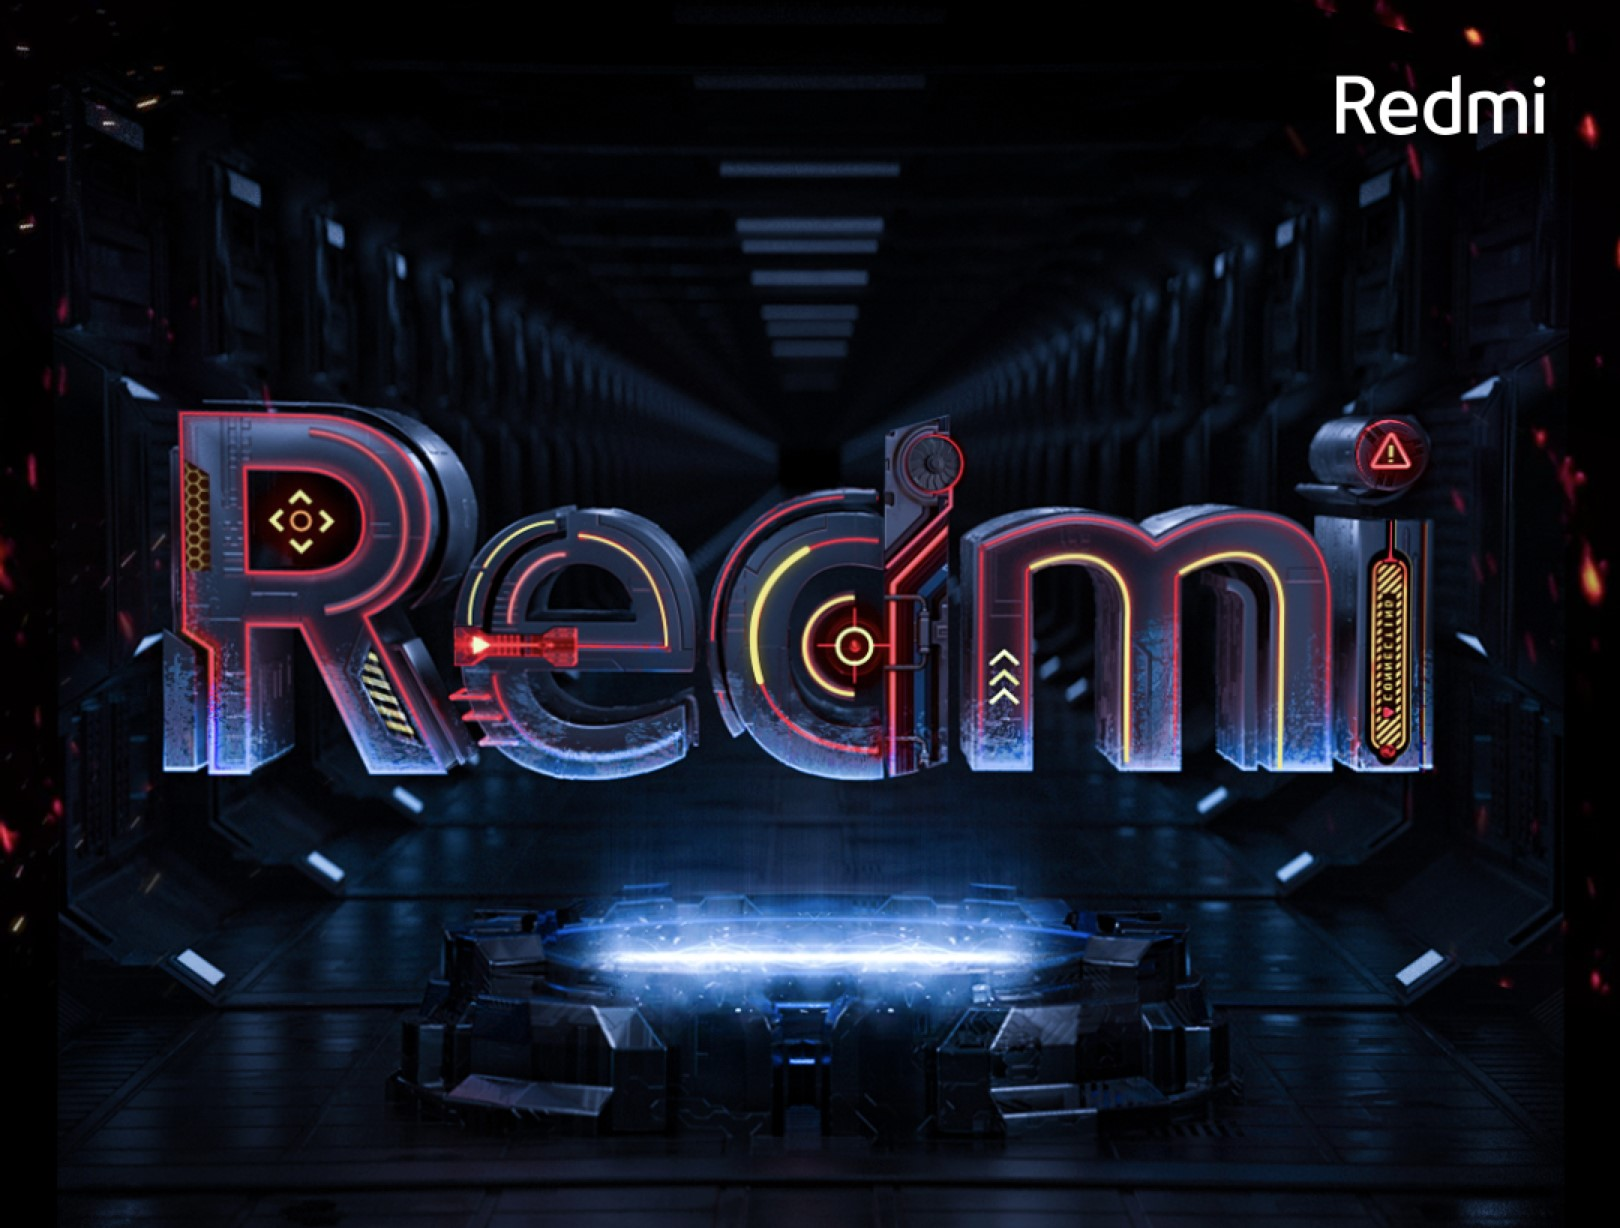 Redmi三款新机入网:最高67W快充